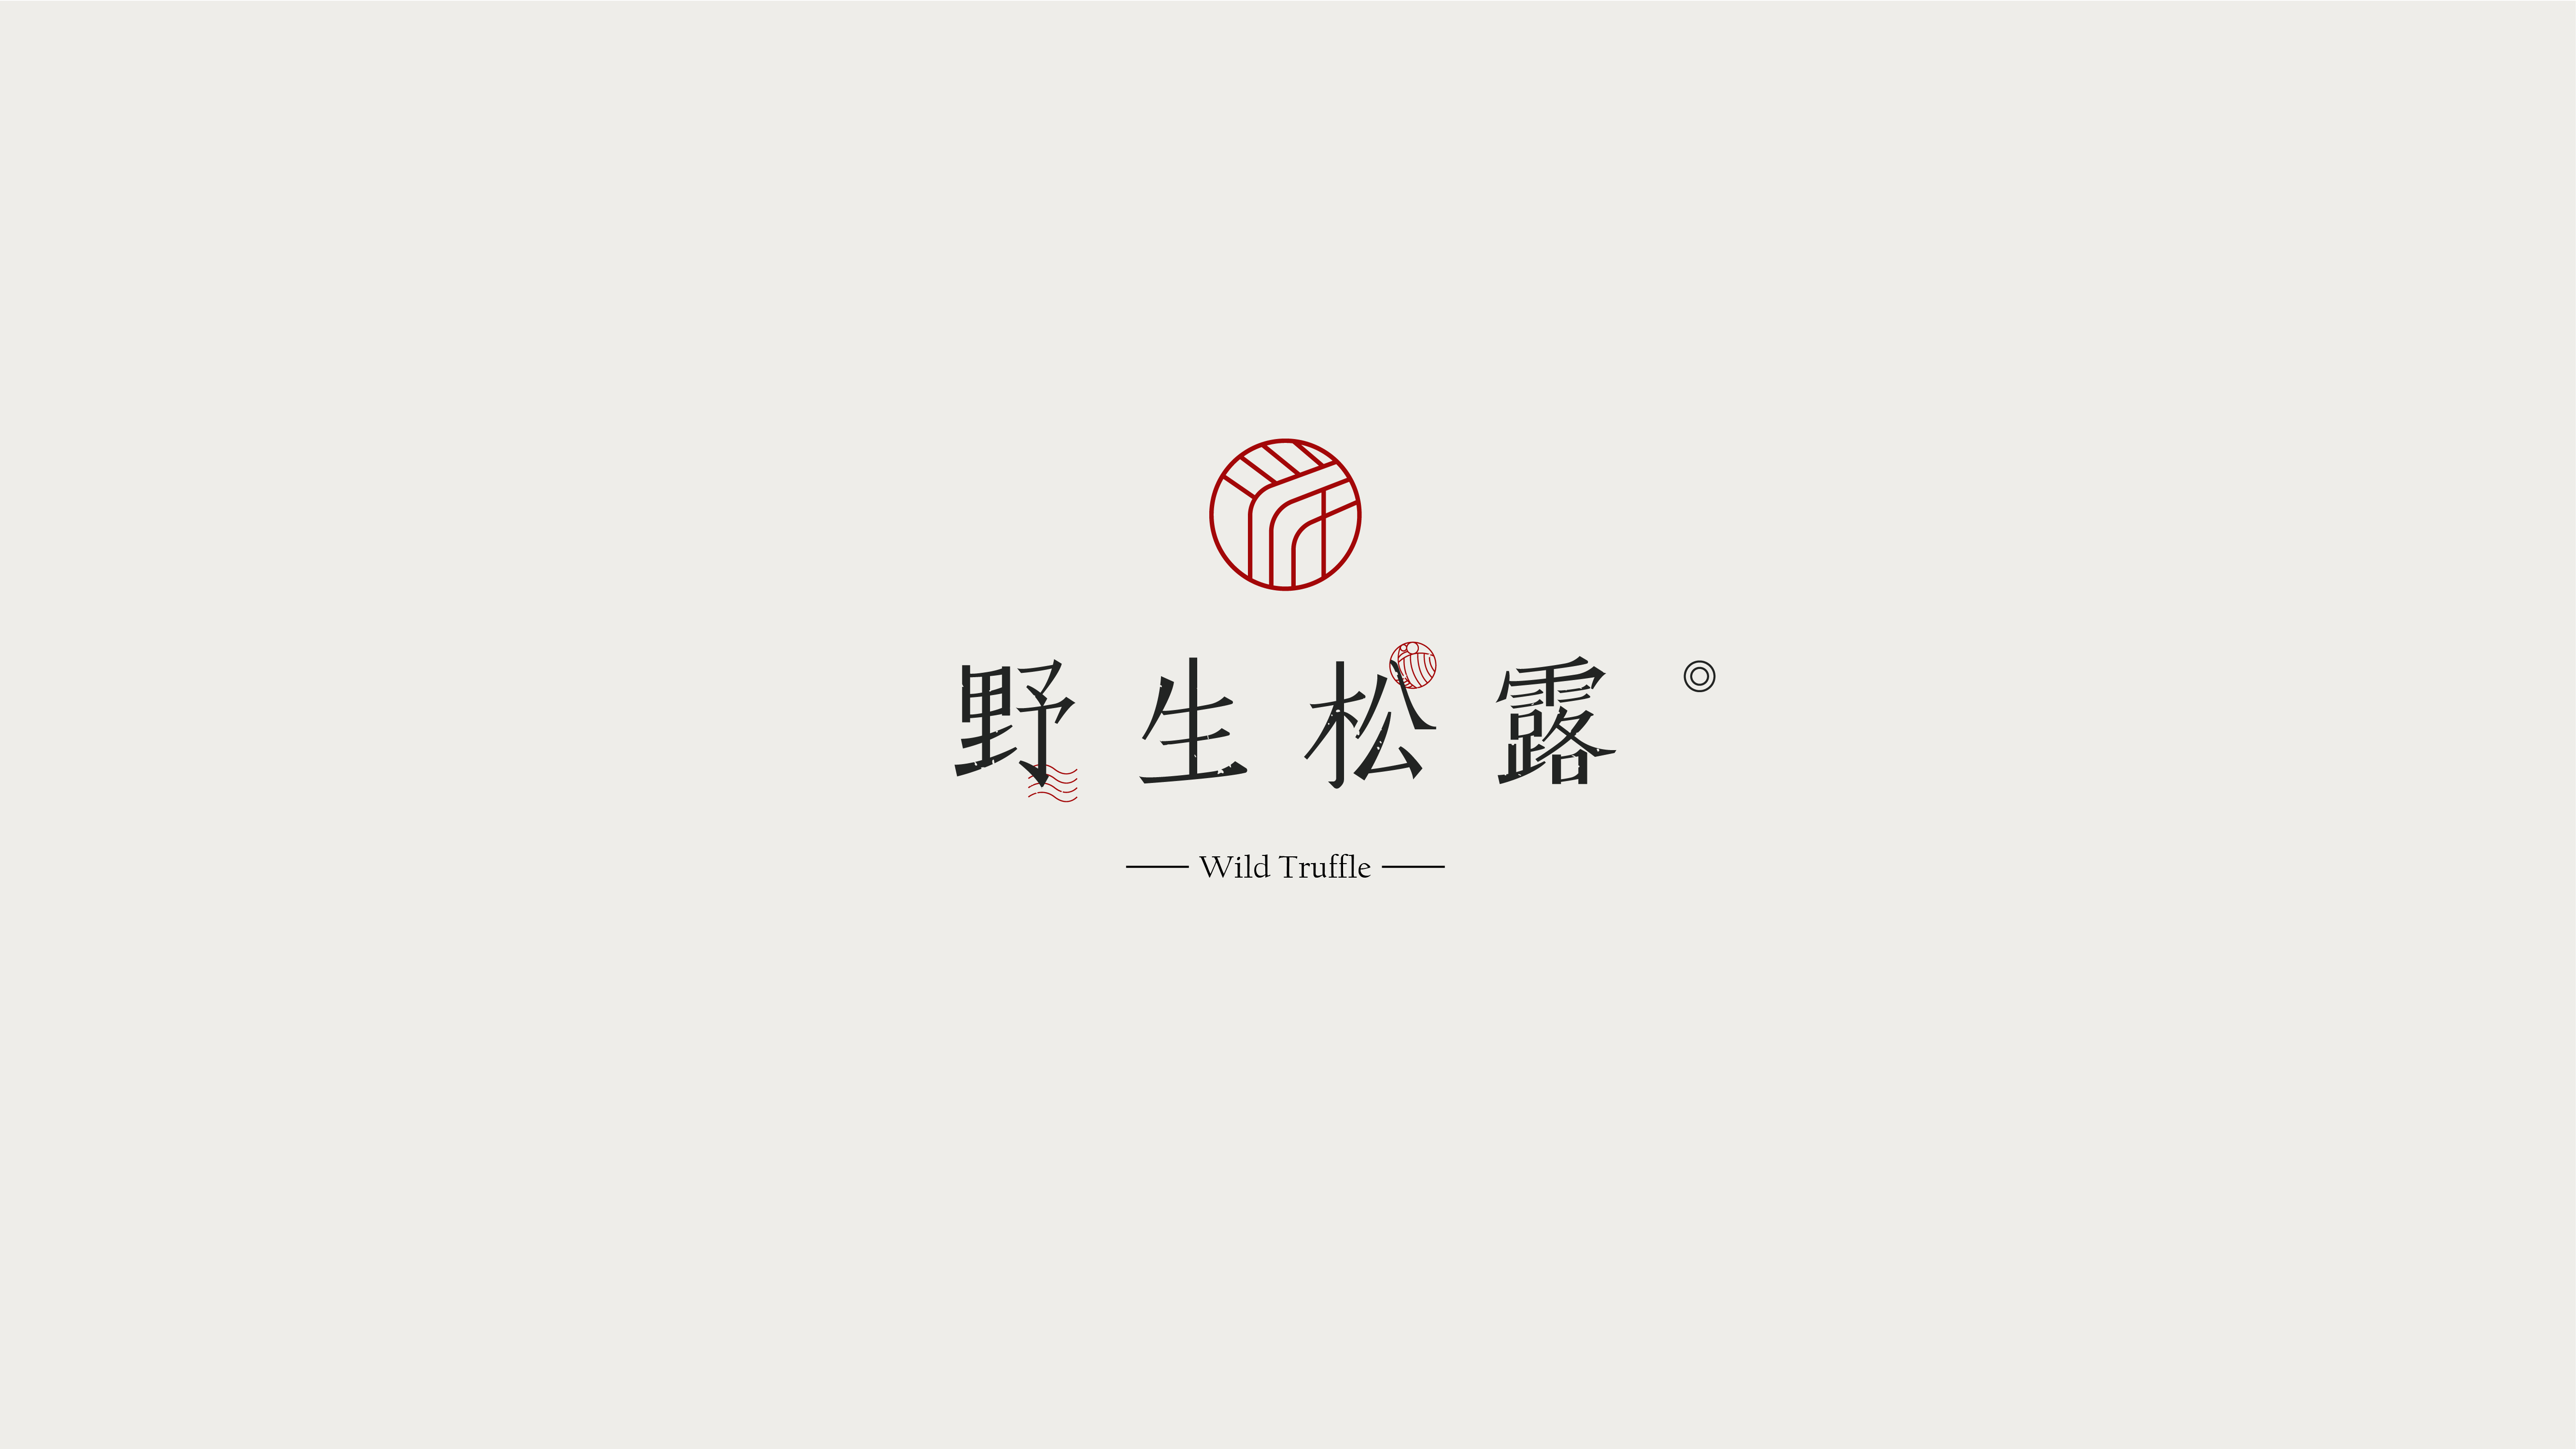 2021 Business Creative Font Design